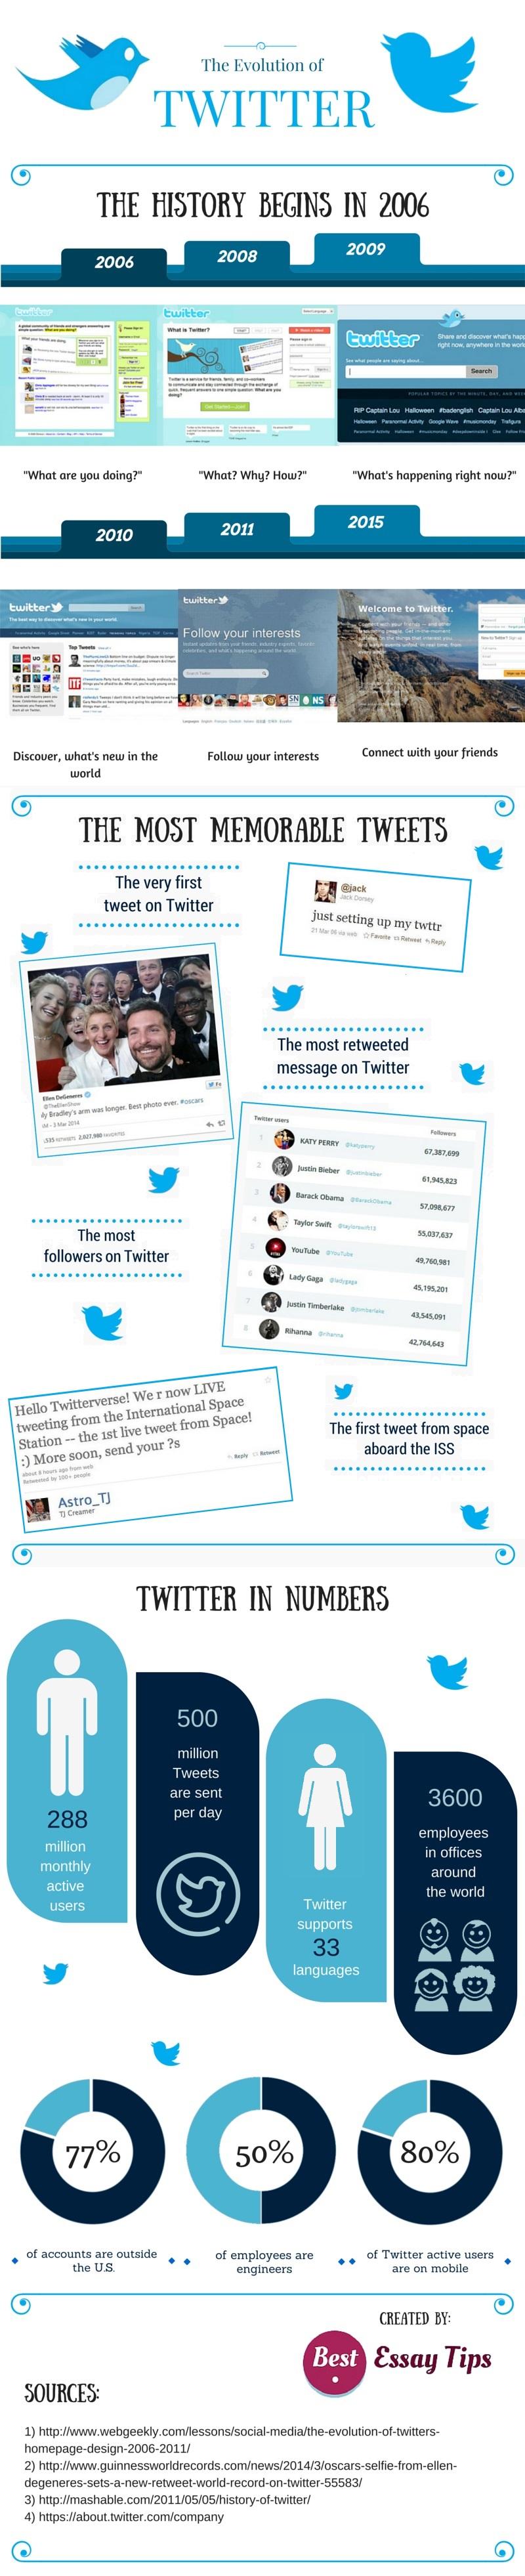 La evolución de Twitter